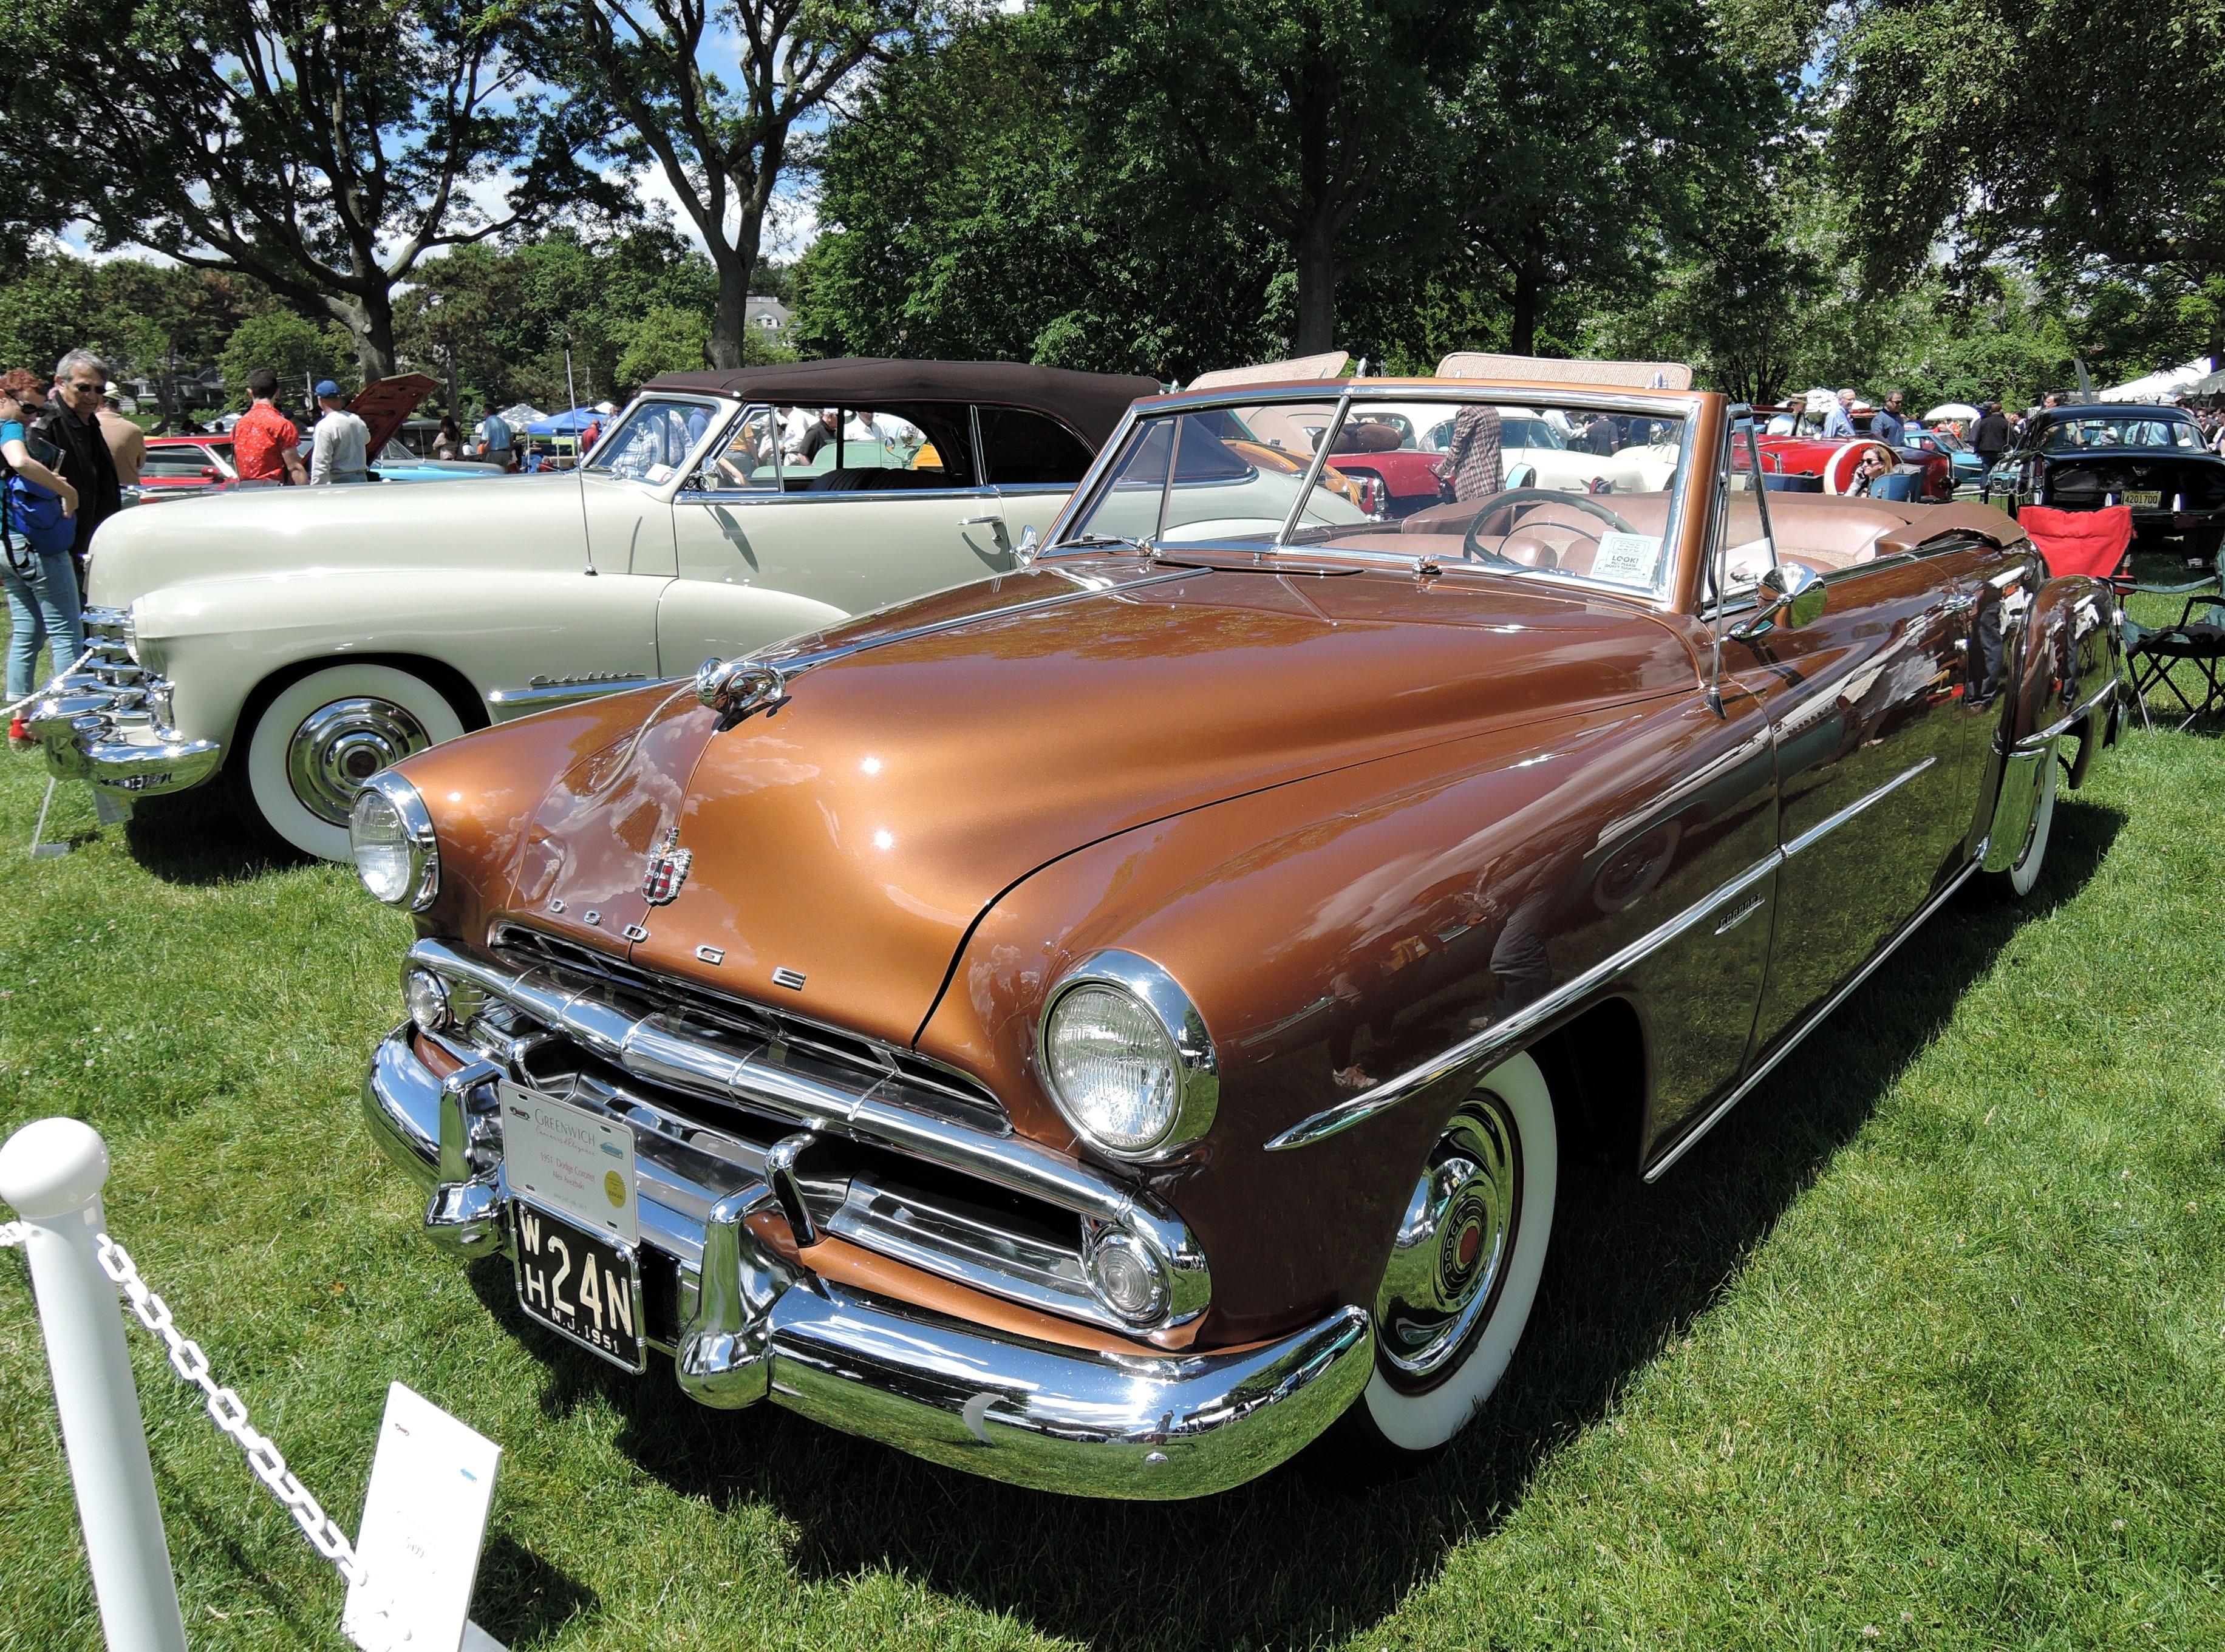 copper 1951 Dodge Coronet - Greenwich Concours d'Elegance 2017